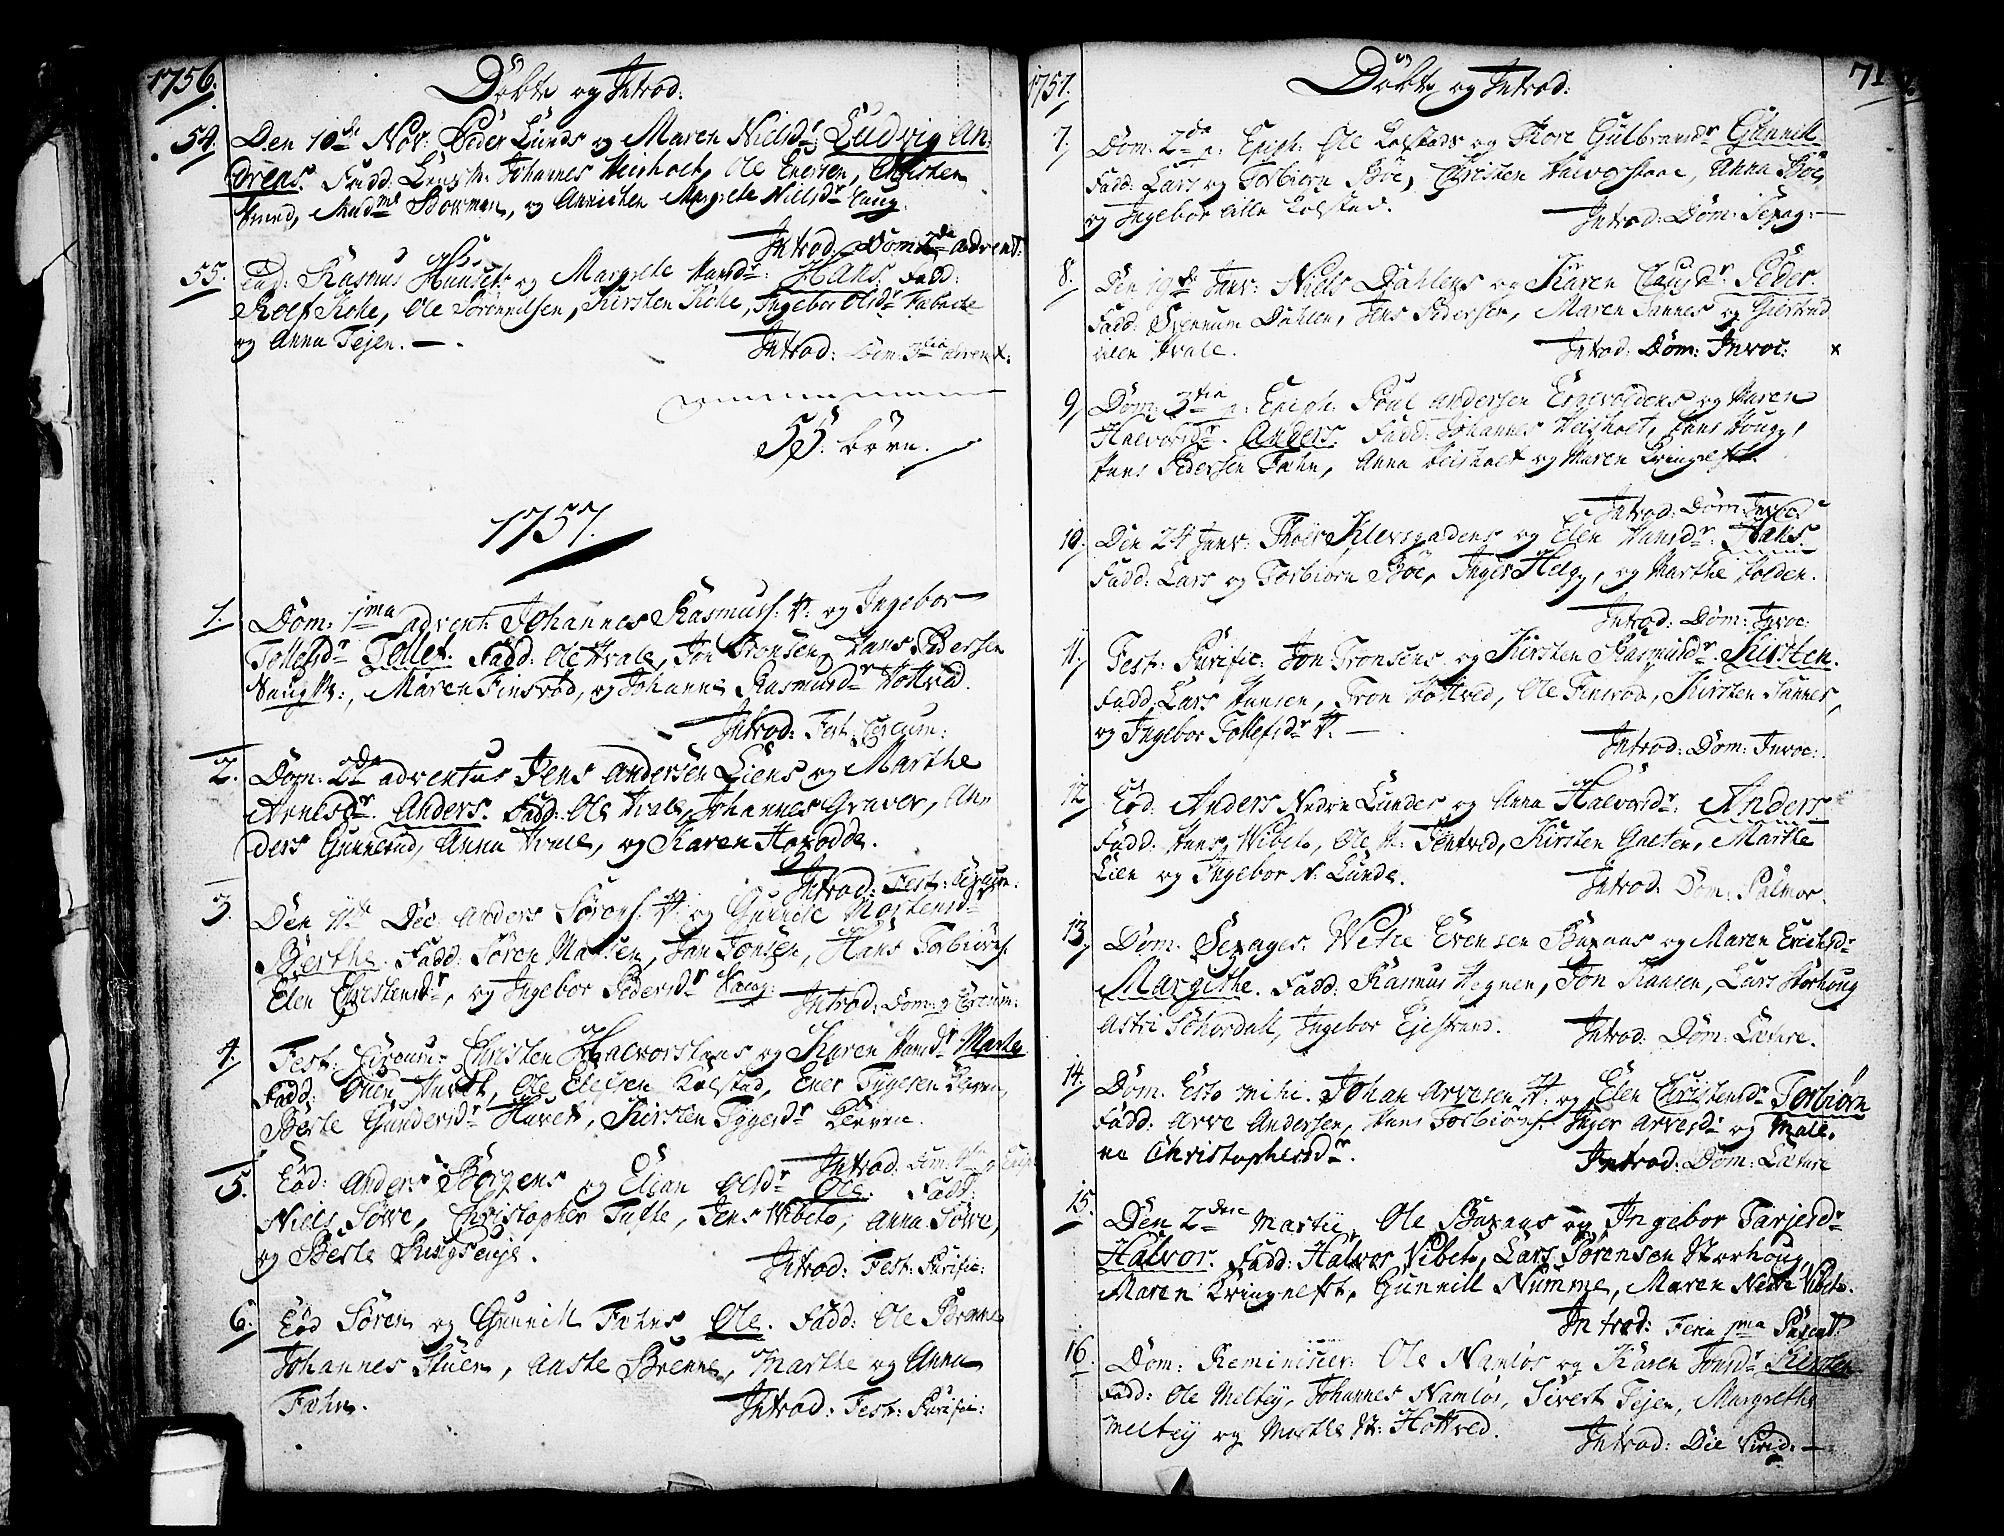 SAKO, Holla kirkebøker, F/Fa/L0001: Ministerialbok nr. 1, 1717-1779, s. 71